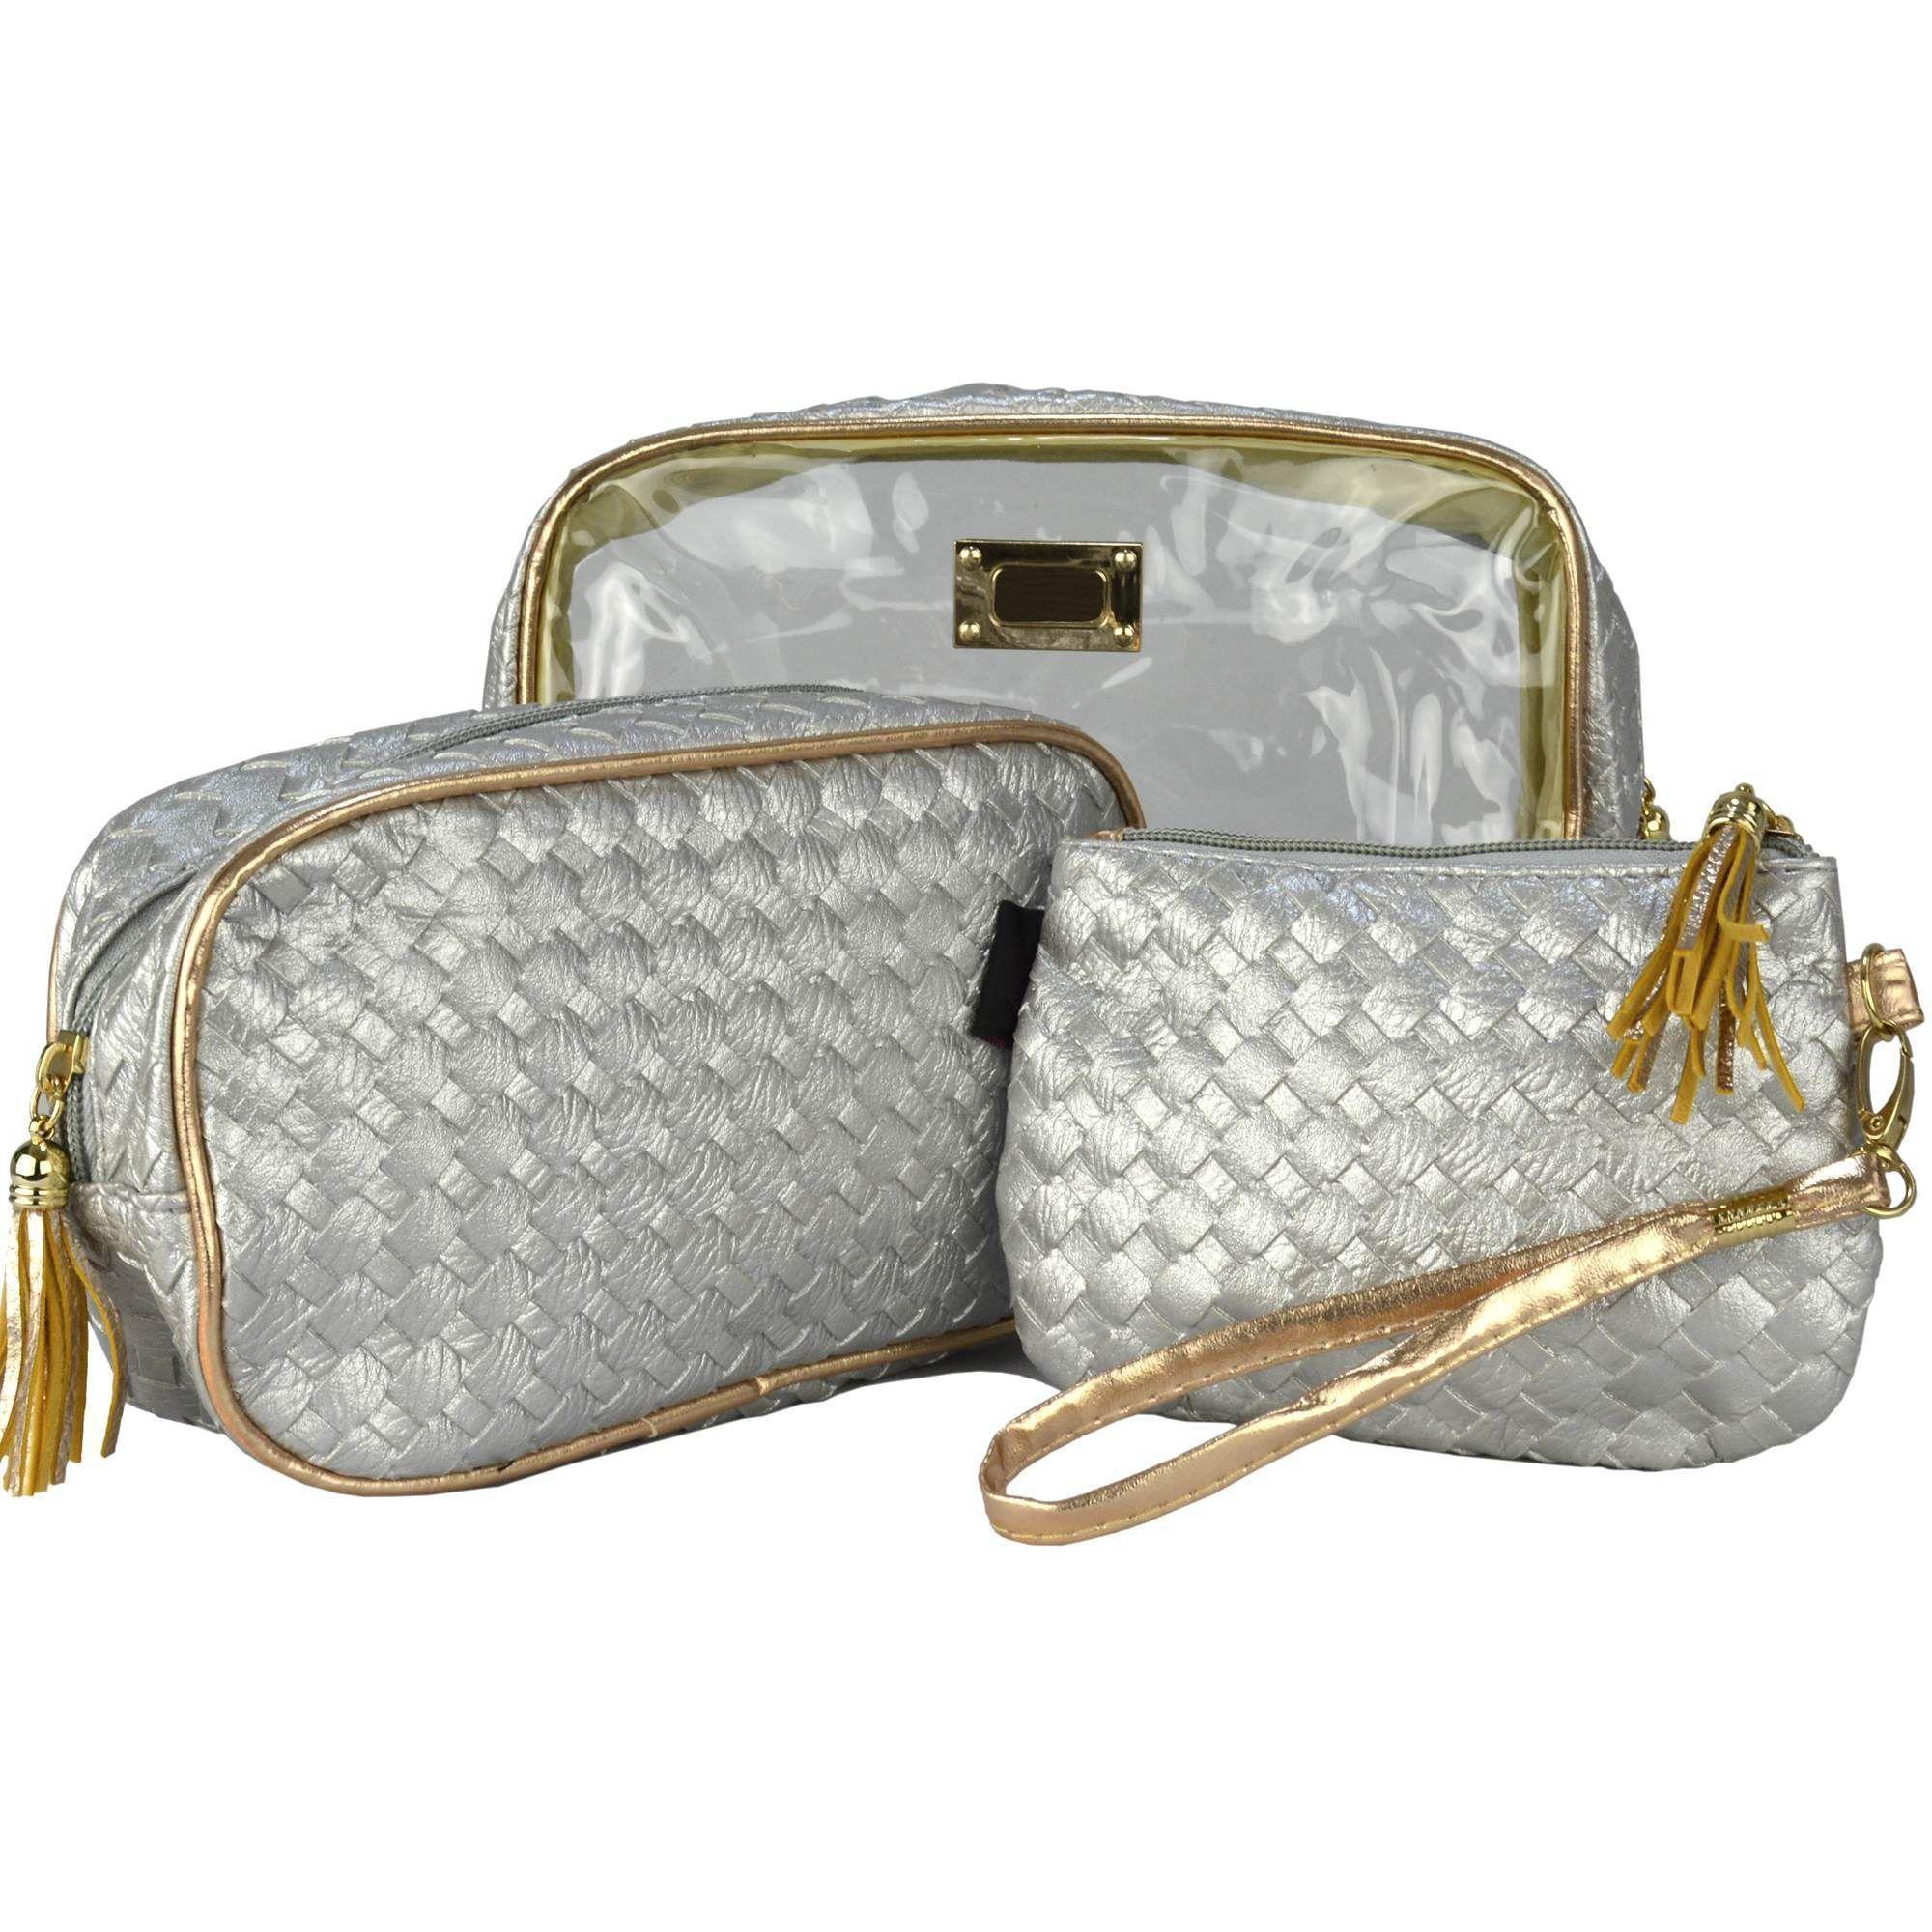 Frasqueiras Necessaire Feminina Luxo Prata Kit 3 Peças CBRN08292